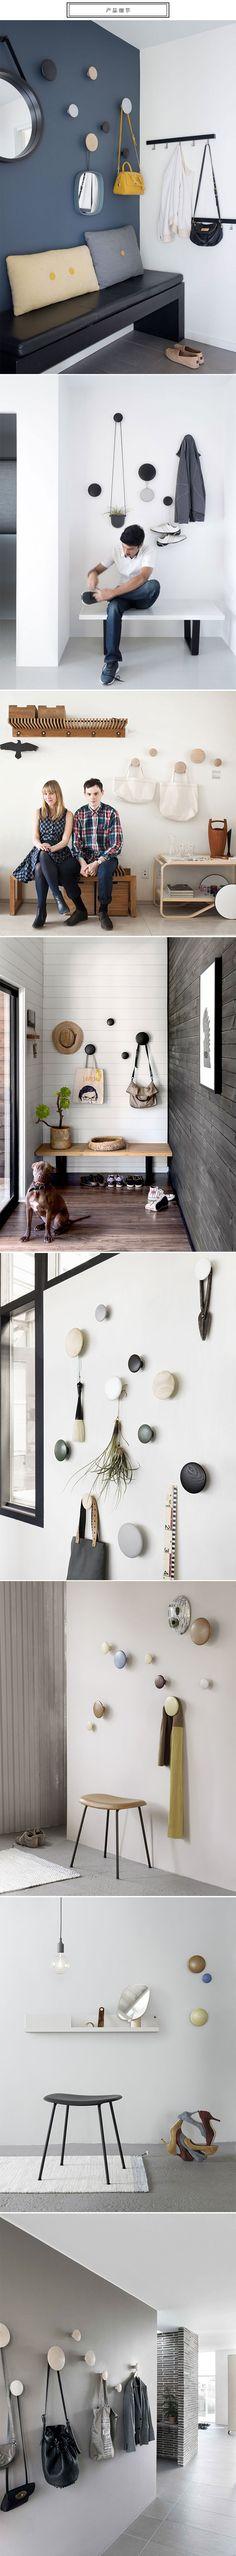 MUUTO The Dots 彩色波点金属/木质衣帽钩系列 装饰挂钩 丹麦设计-淘宝网